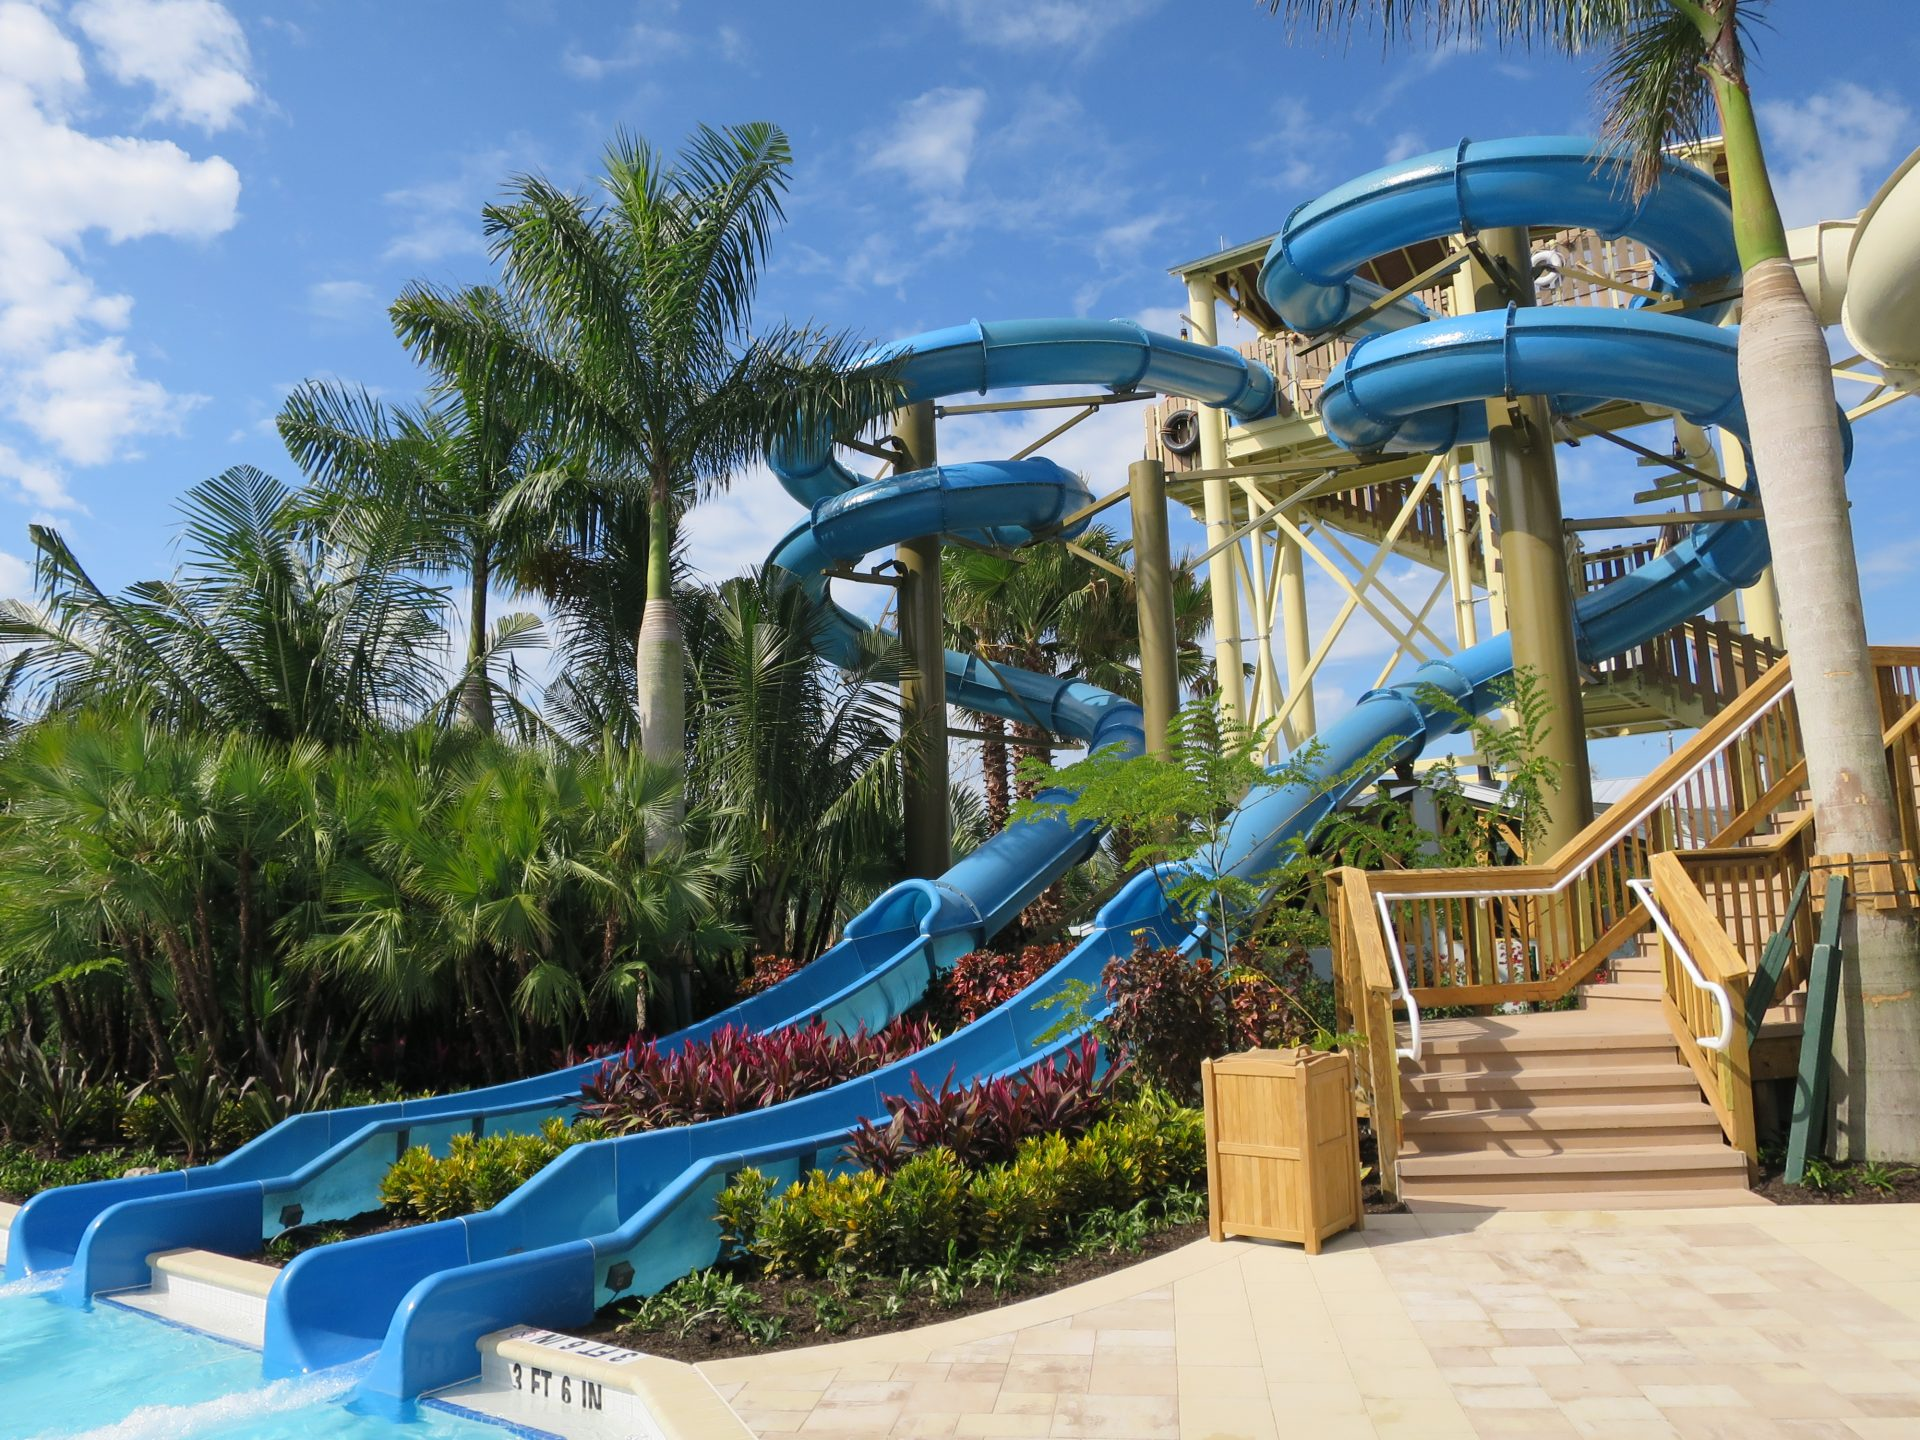 Hyatt Regency Coconut Point slide tower empties into lazy river designed by Martin Aquatic